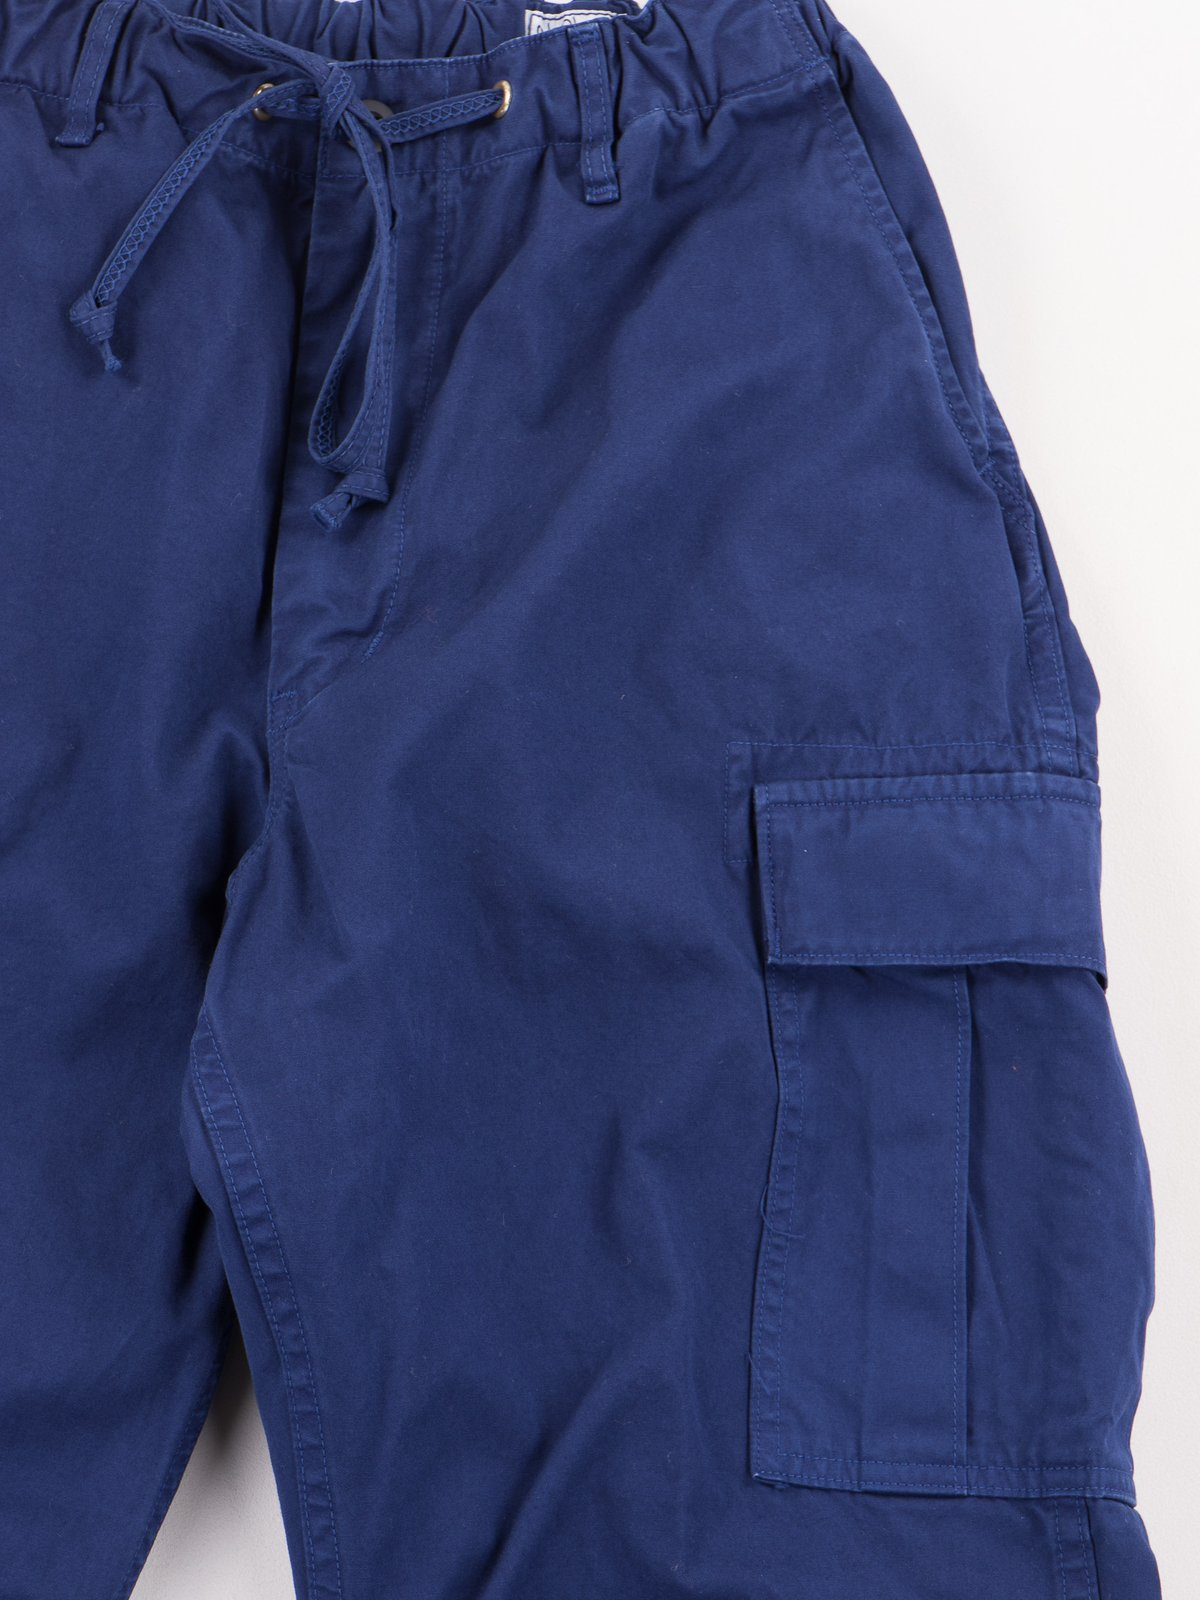 Ink Blue Poplin Easy Cargo Pant - Image 5